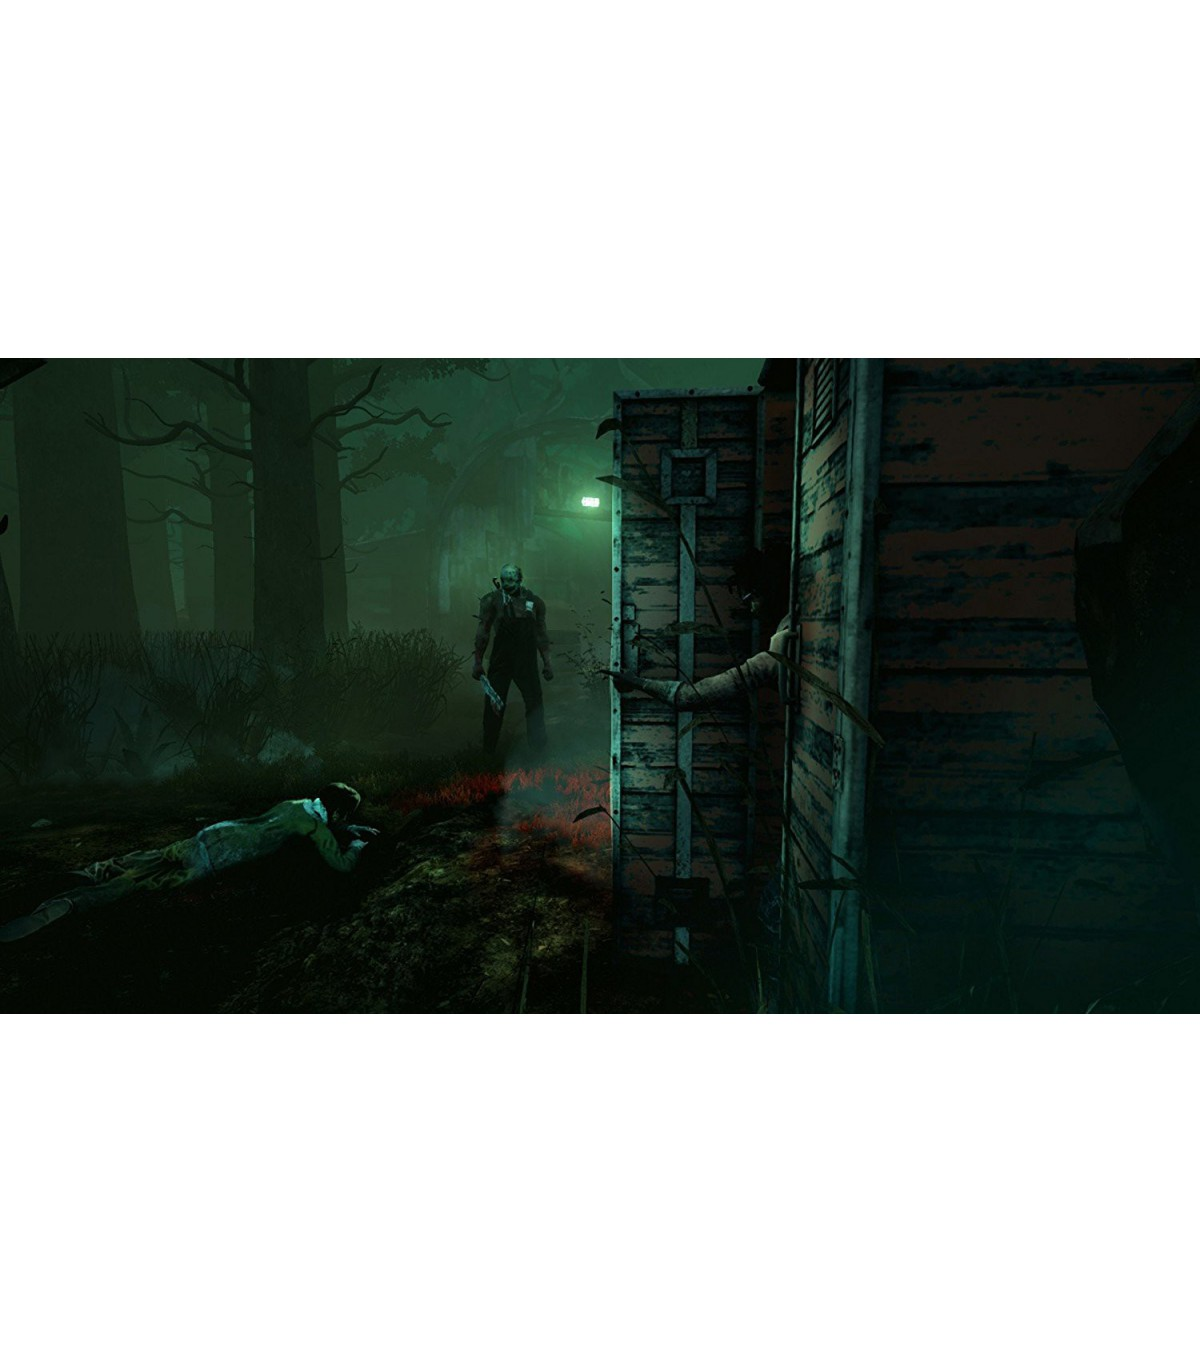 بازی Dead by Daylight کارکرده - پلی استیشن 4